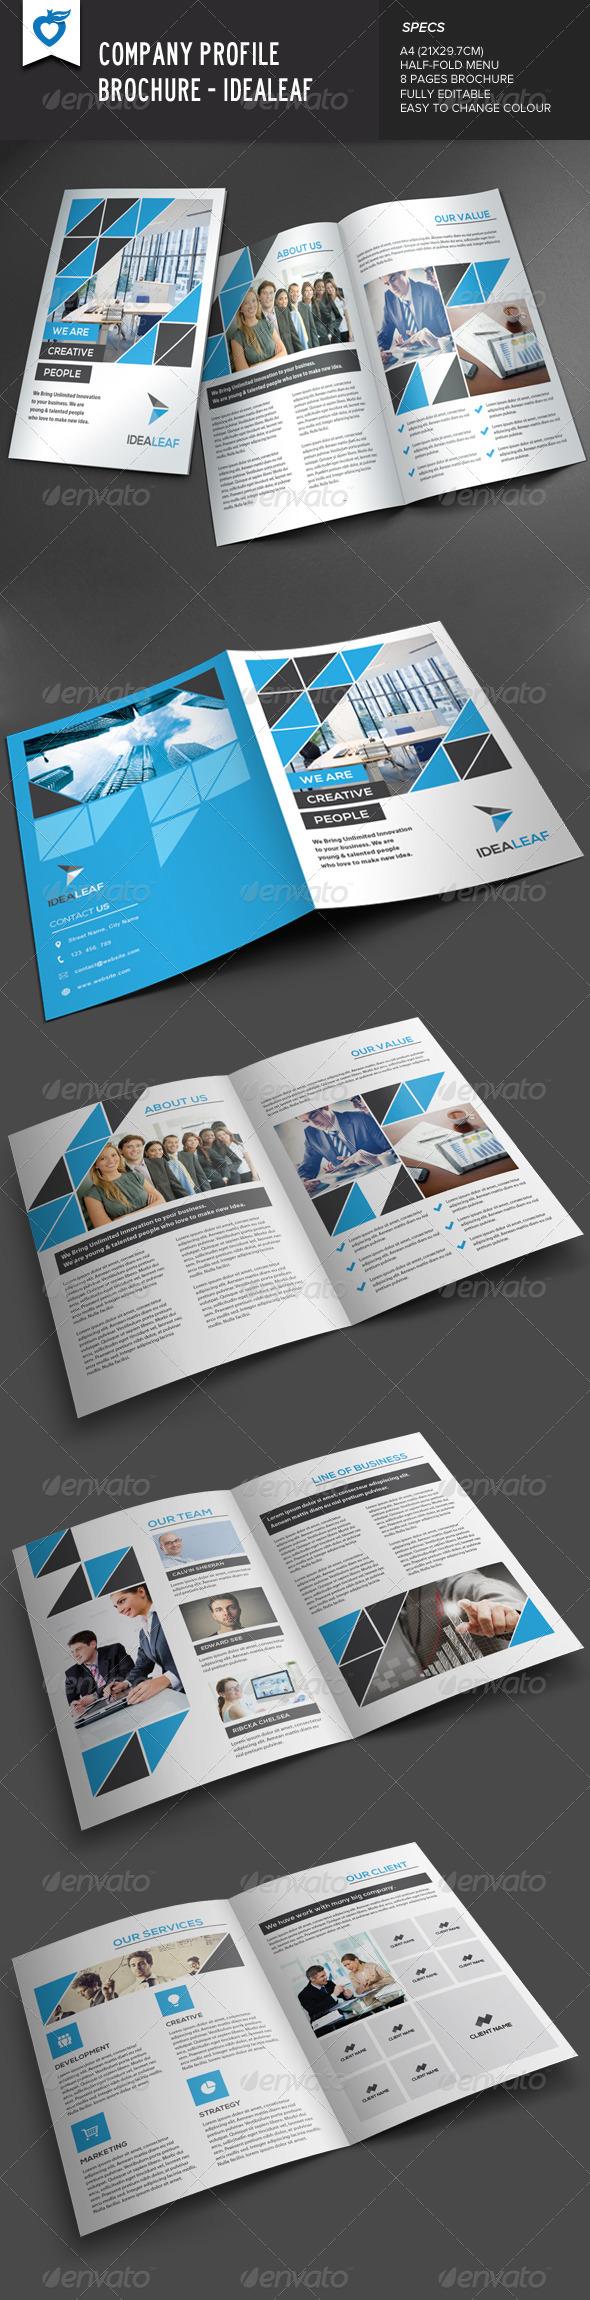 Company Profile By Leaflove Graphicriver